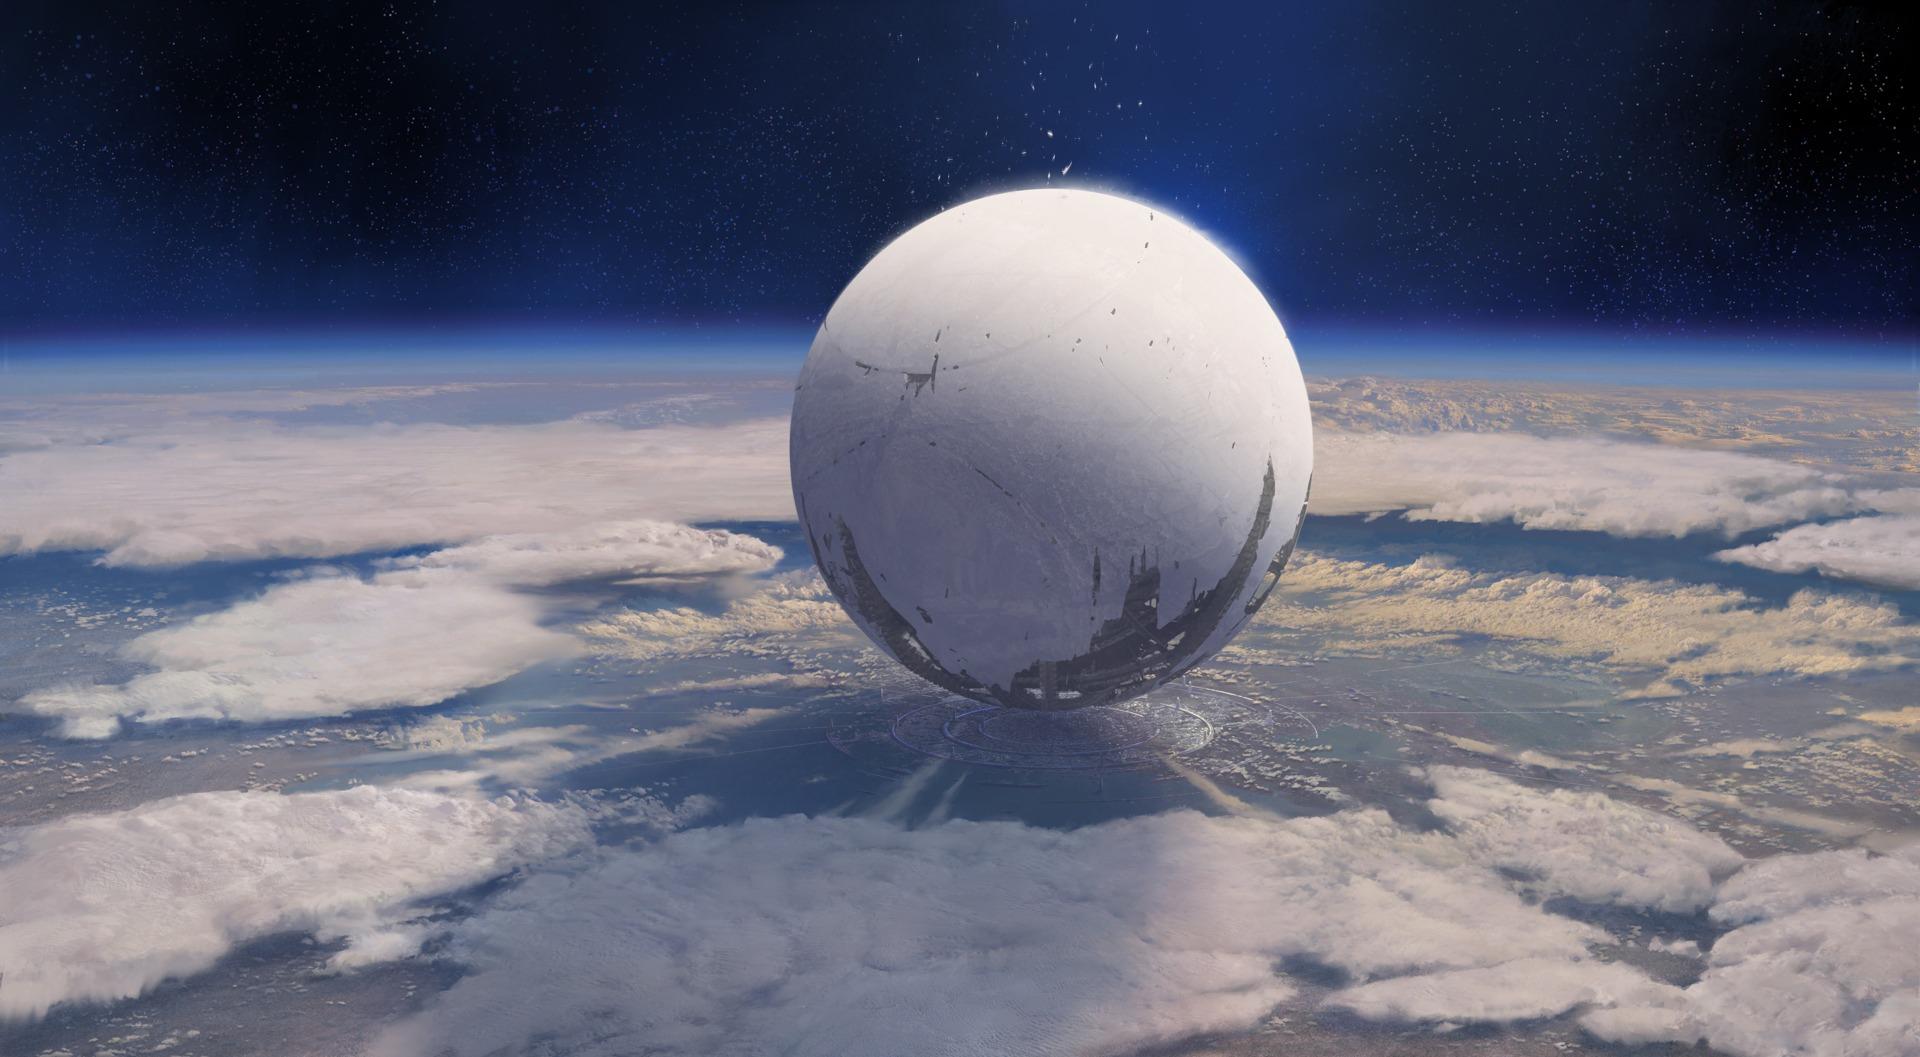 Destiny 2: Forsaken might initiate a huge change in Destiny's lore